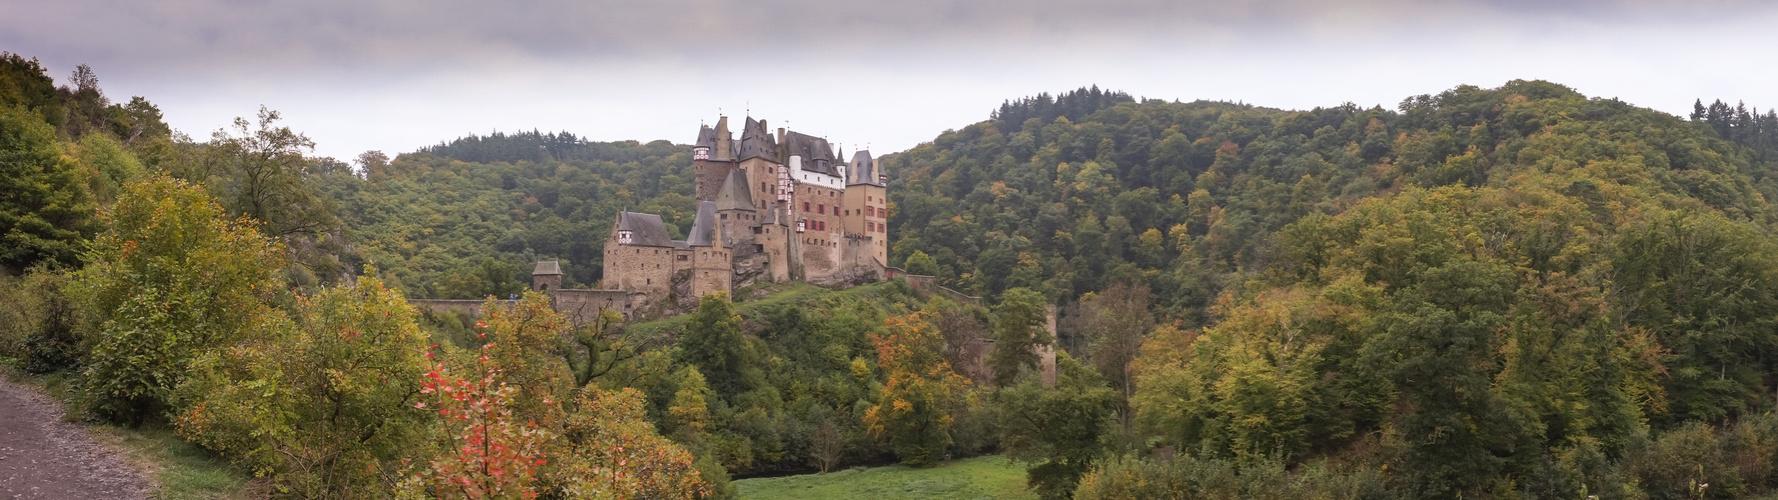 Panorama Burg Eltz